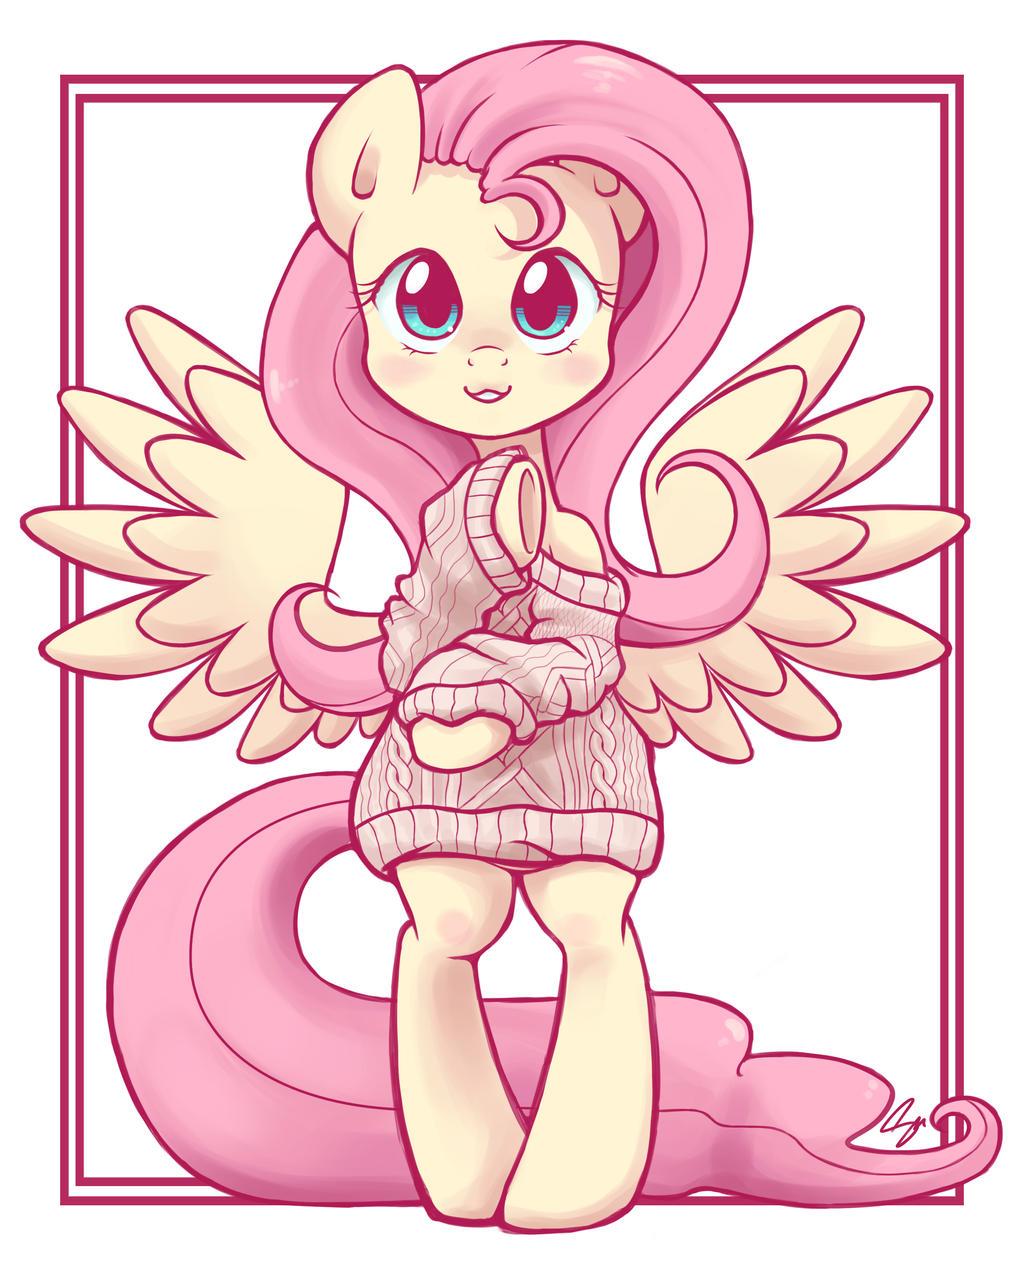 Sweatershy